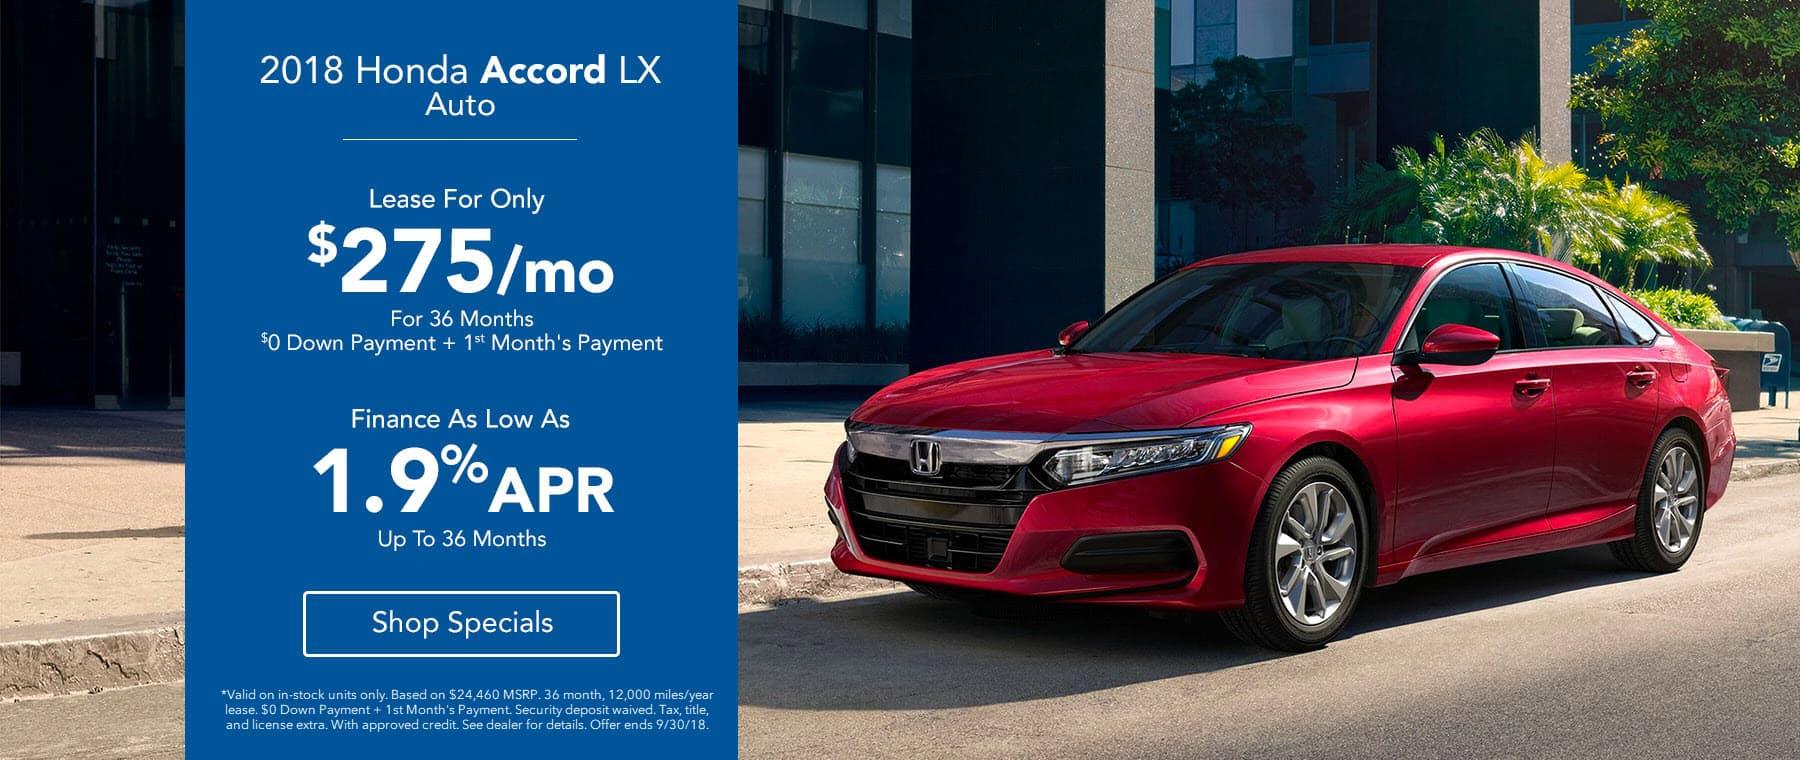 2018 Legends Honda Accord LX